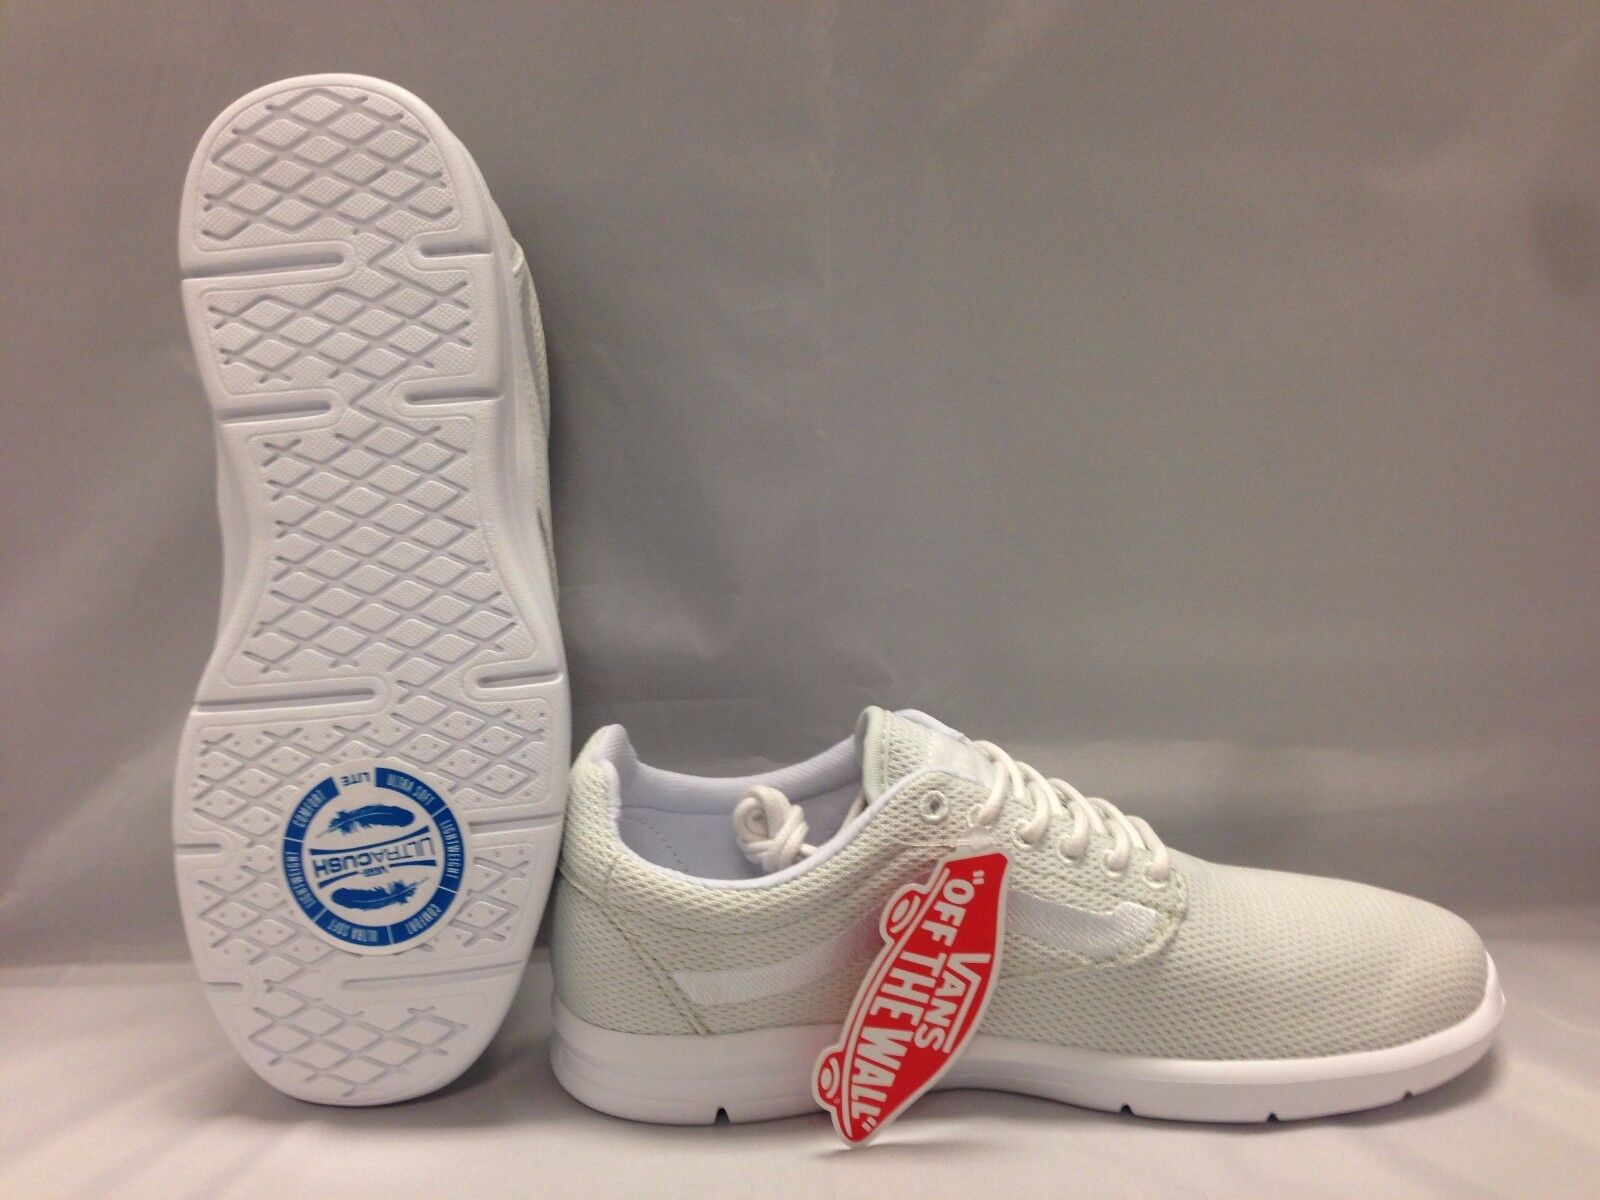 Vans Men's Men's Men's shoes  ISO 1.5  (Zephir) True White 0f6712